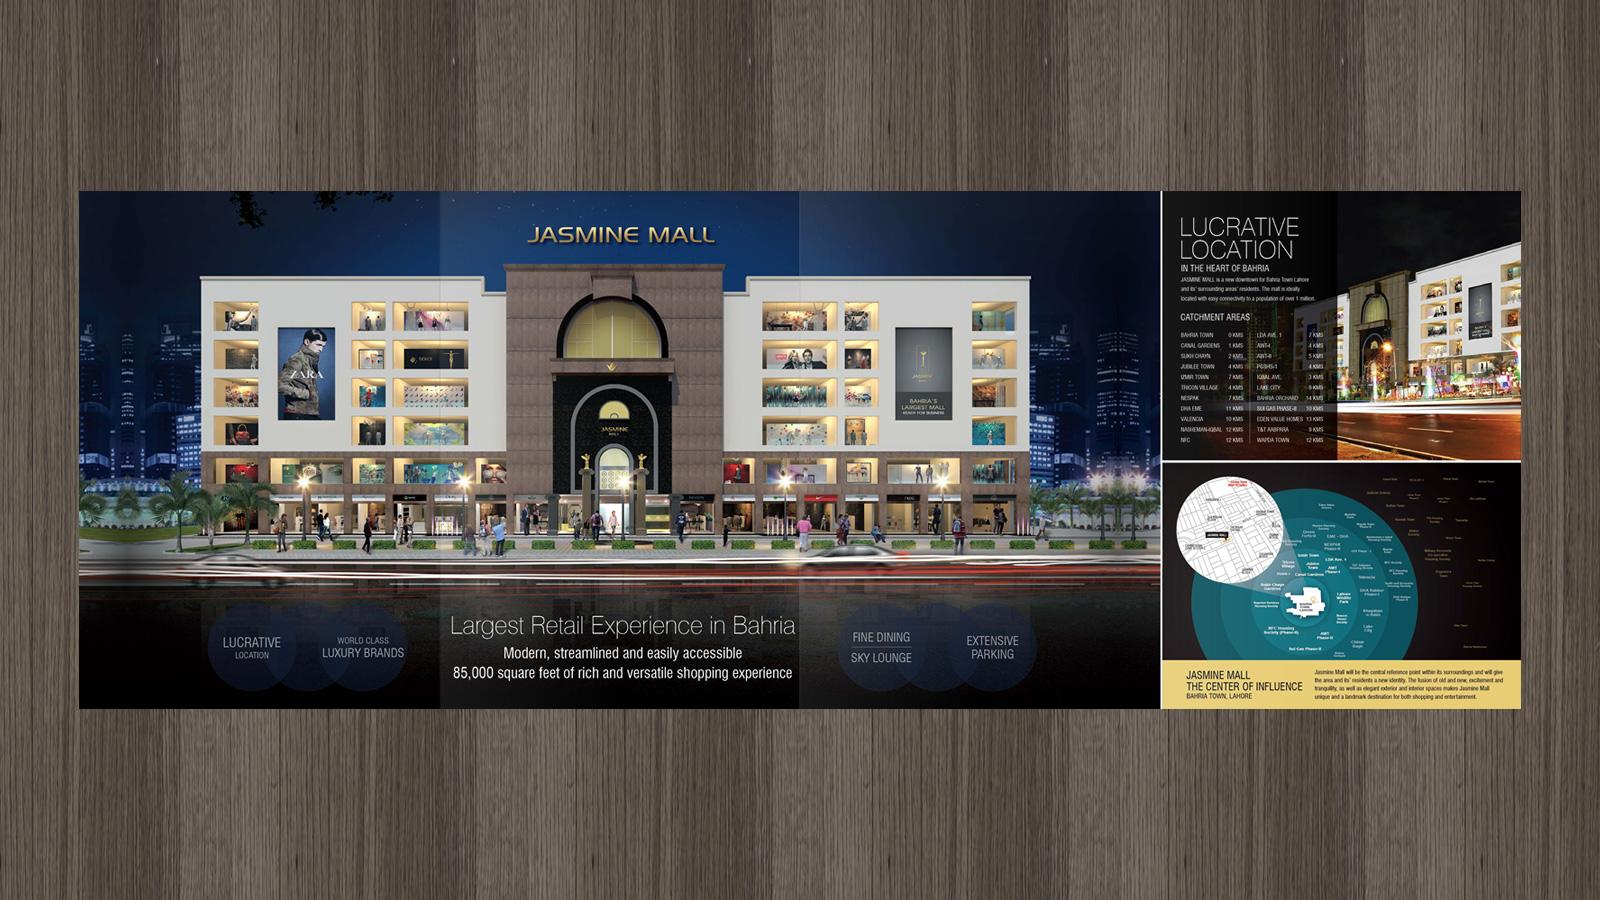 graphic-brand-design-web-designer-hiline-lahore-pakistan-jasmine-mall-002